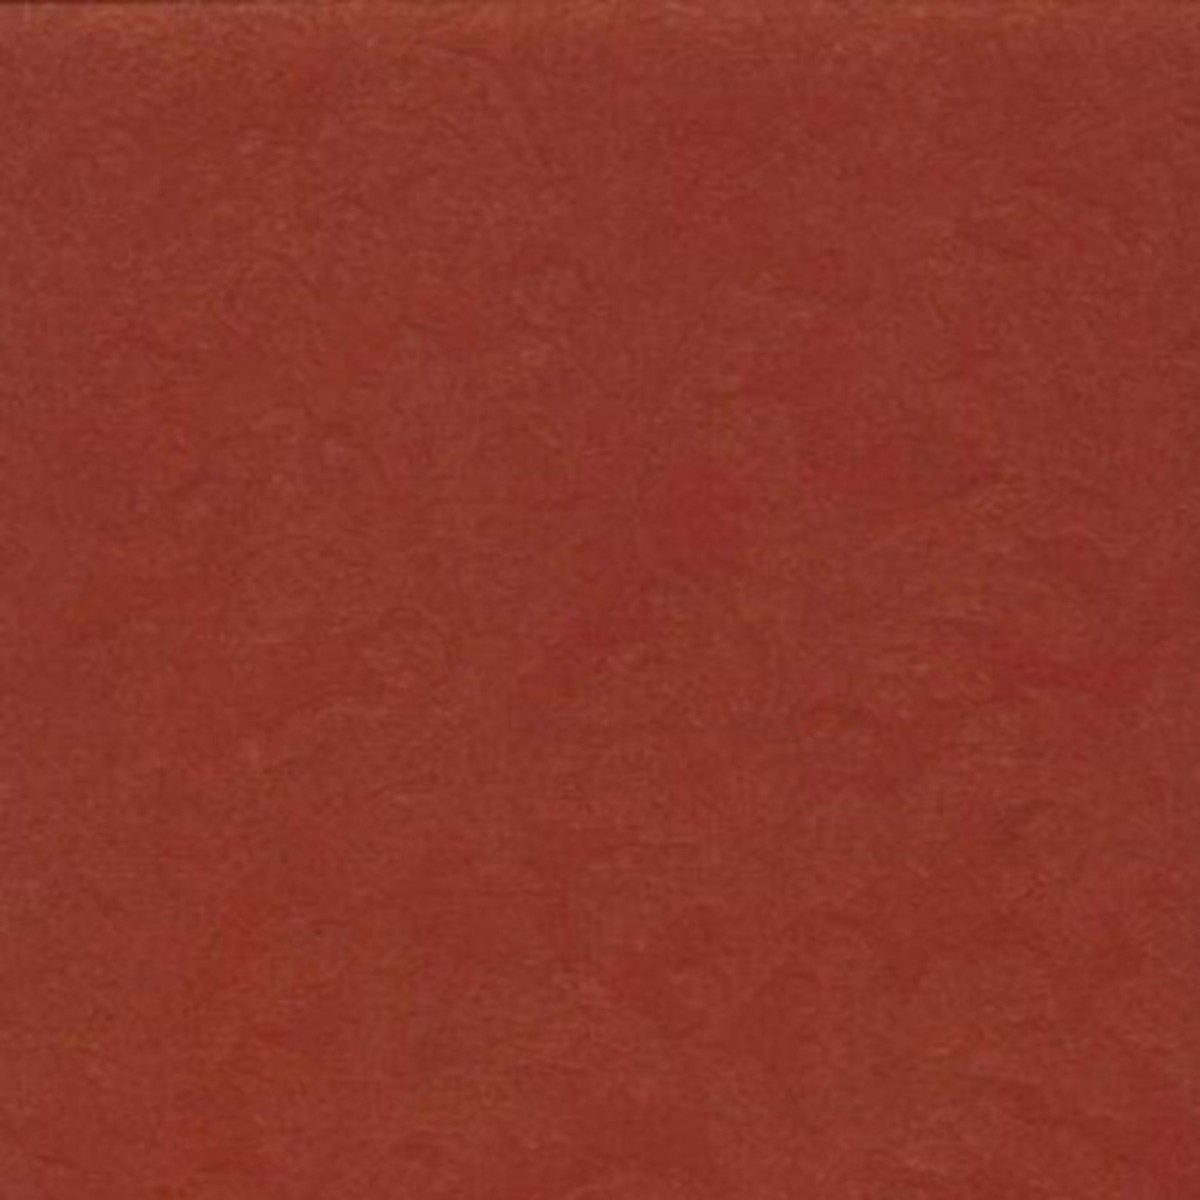 Обои виниловые Limonta Neapolis красные 0.53 м 90505L